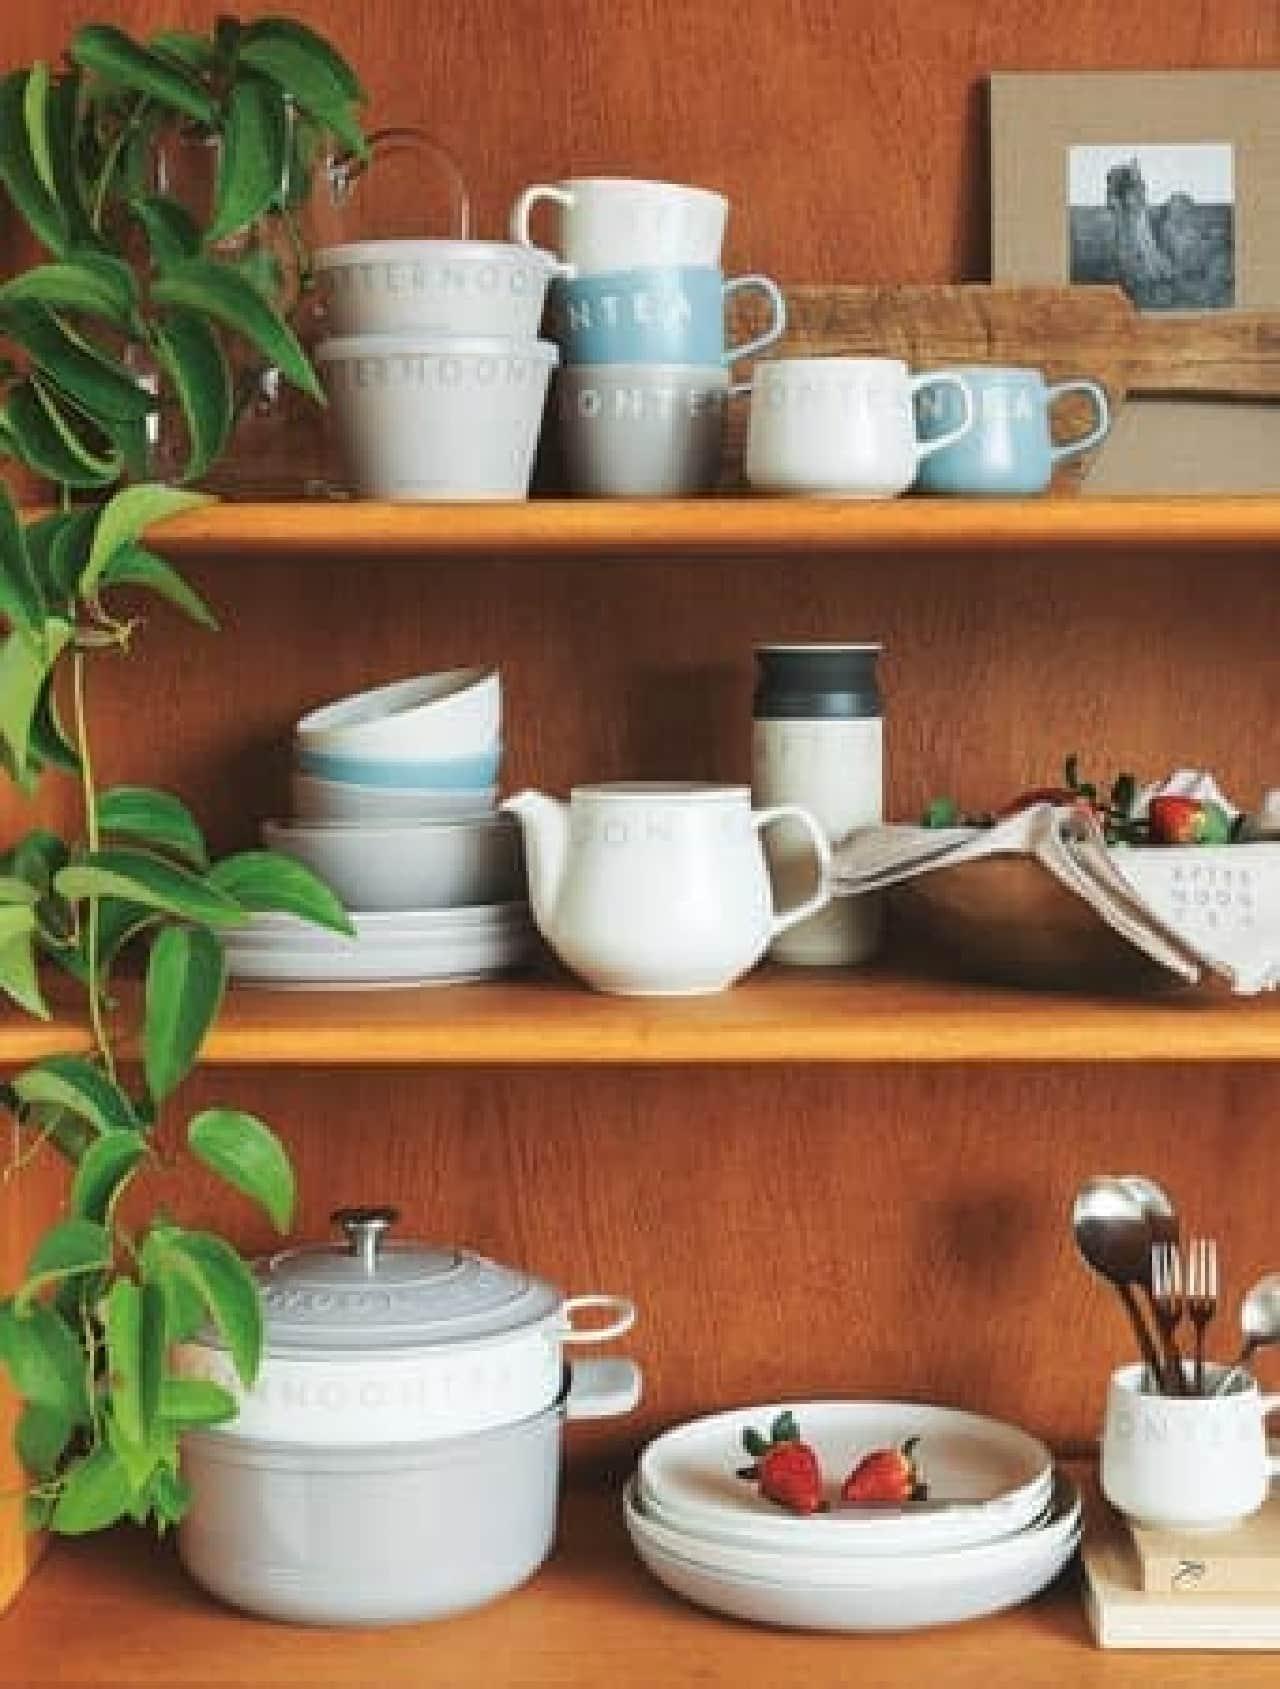 Afternoon Tea LIVINGからボウル&プレート新商品 -- シンプルで和洋どちらにも